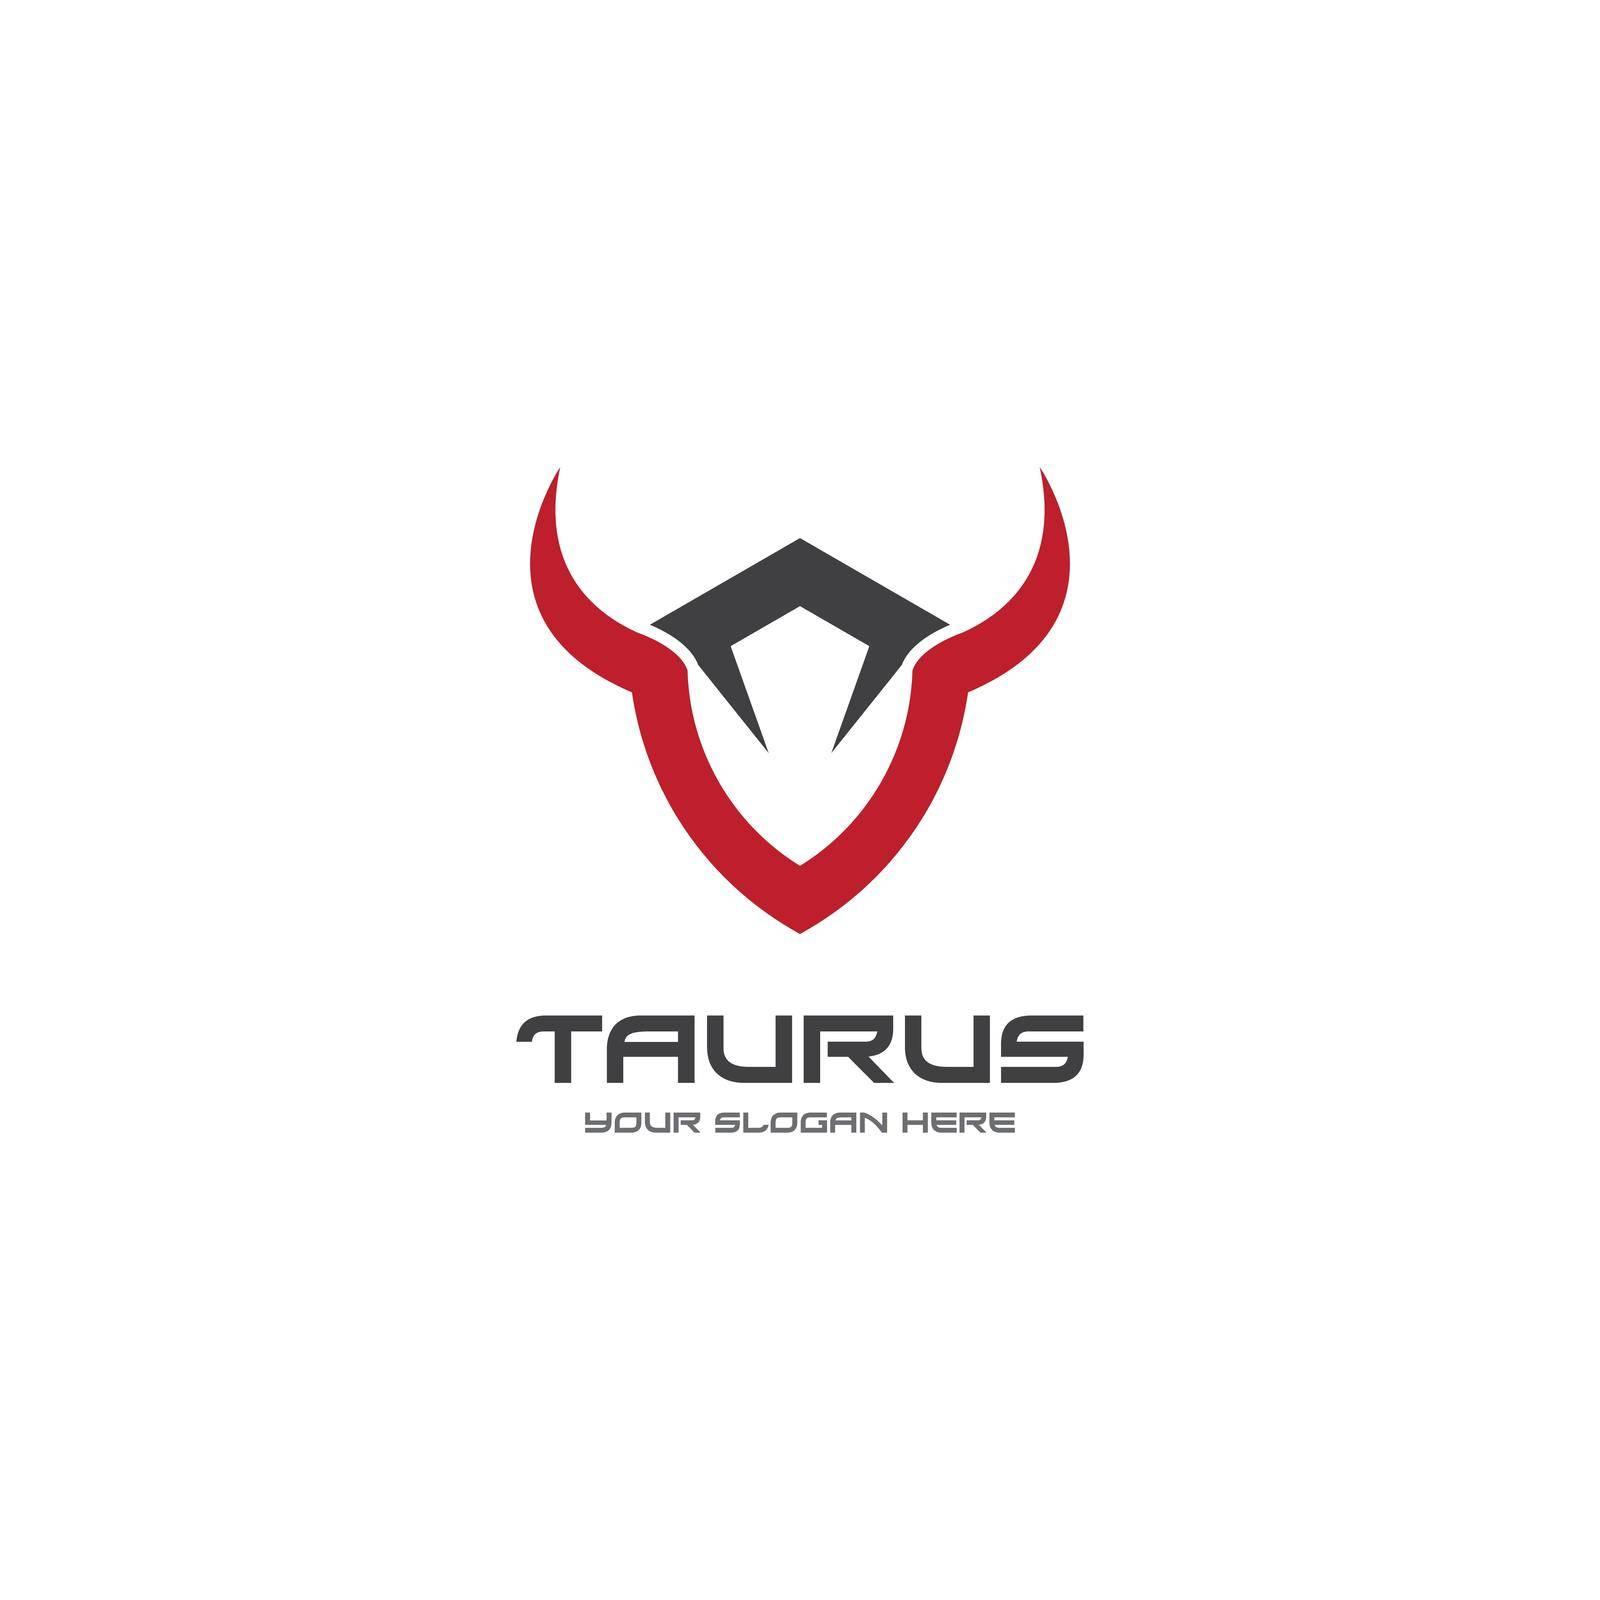 Taurus logo template vector design illustration